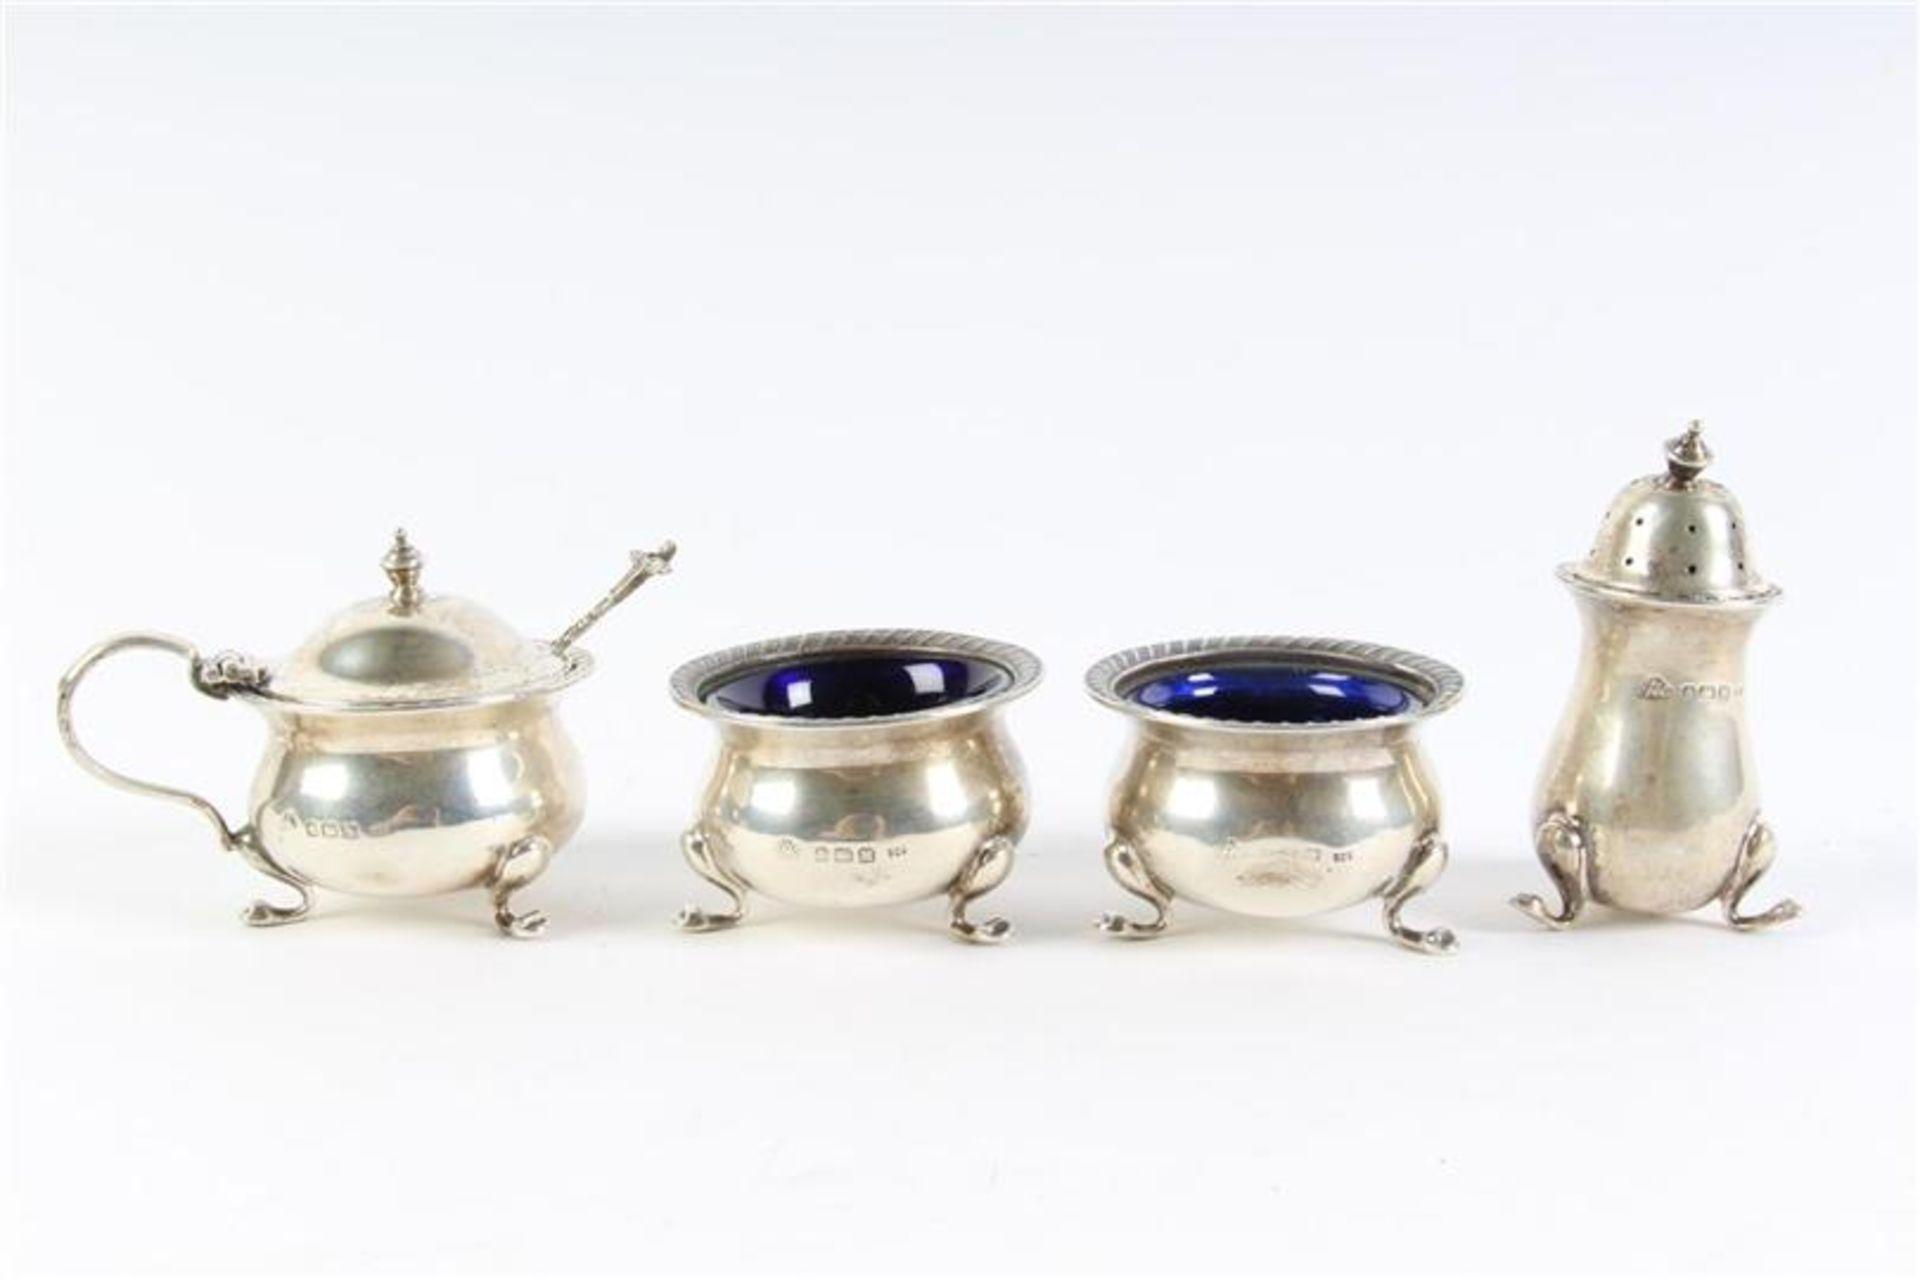 Vierdelig zilveren menageset, Engels gekeurd. - Bild 2 aus 2